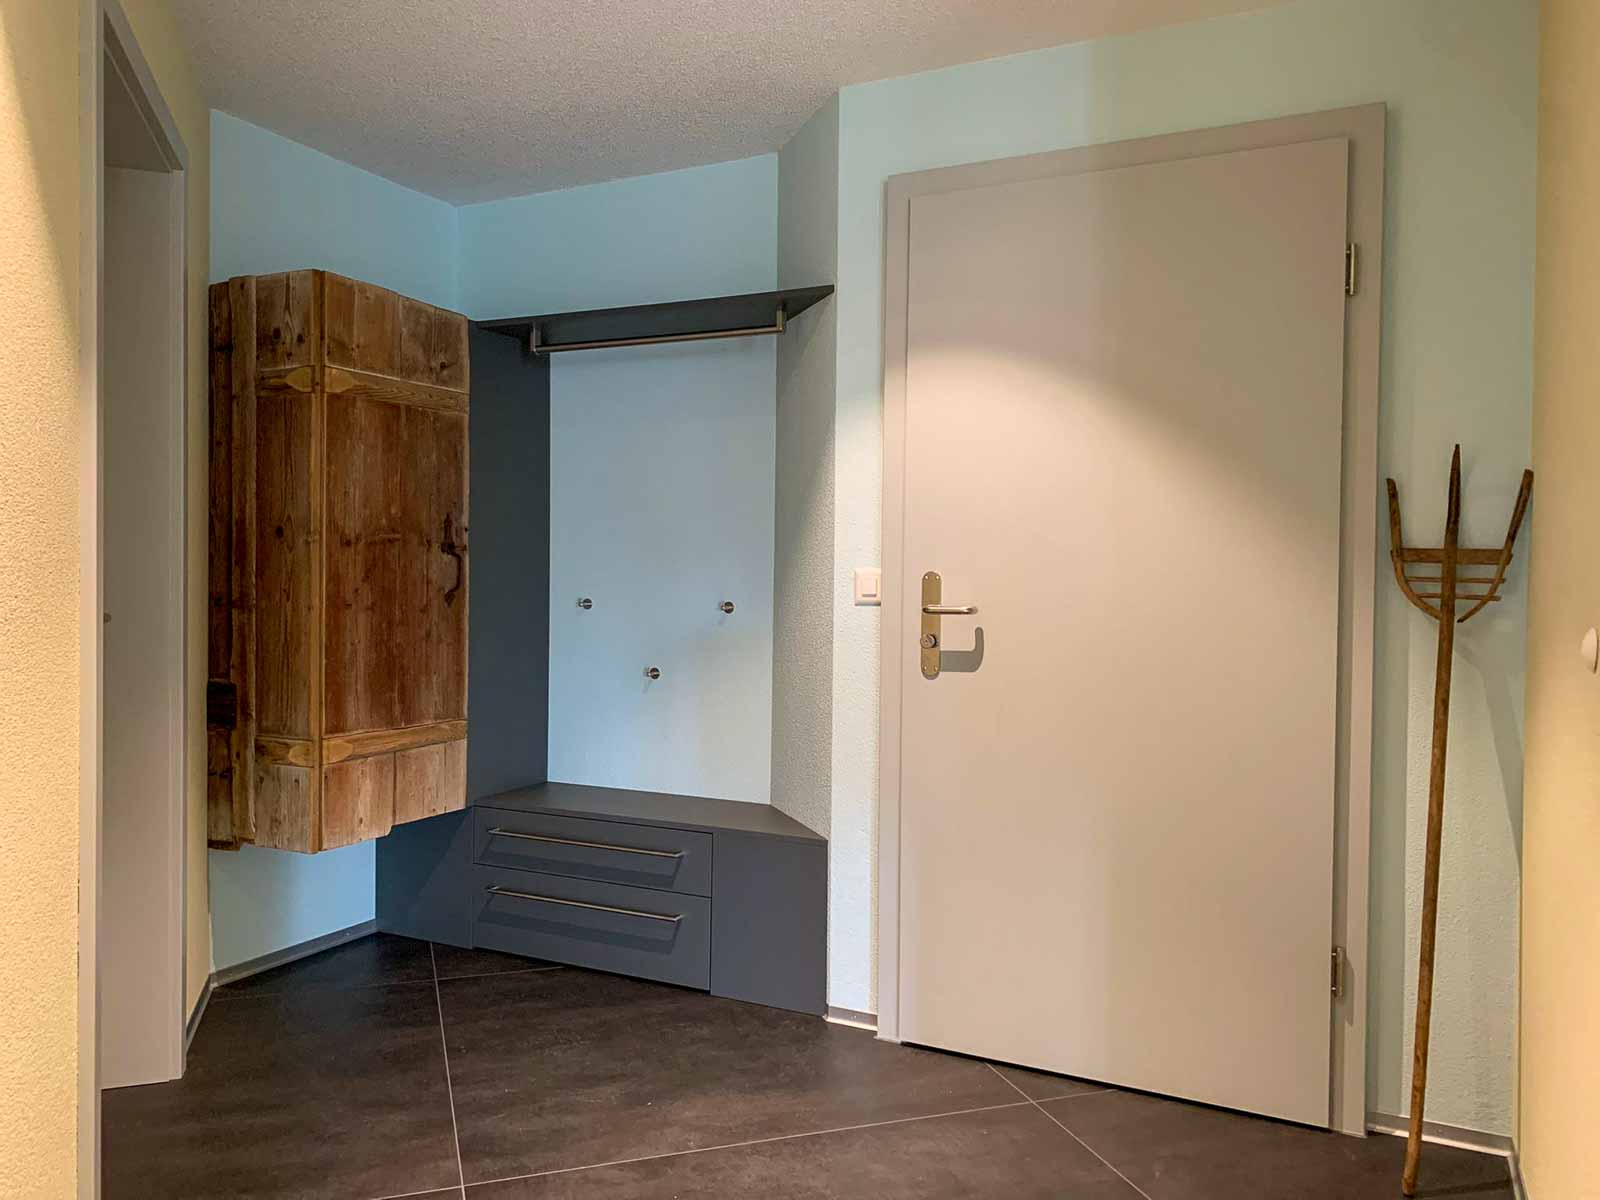 Woodddesign_Holzdesign_Altholz_Garderobe_modern_rustikal_gebürstet_Gästegarderobe (3)